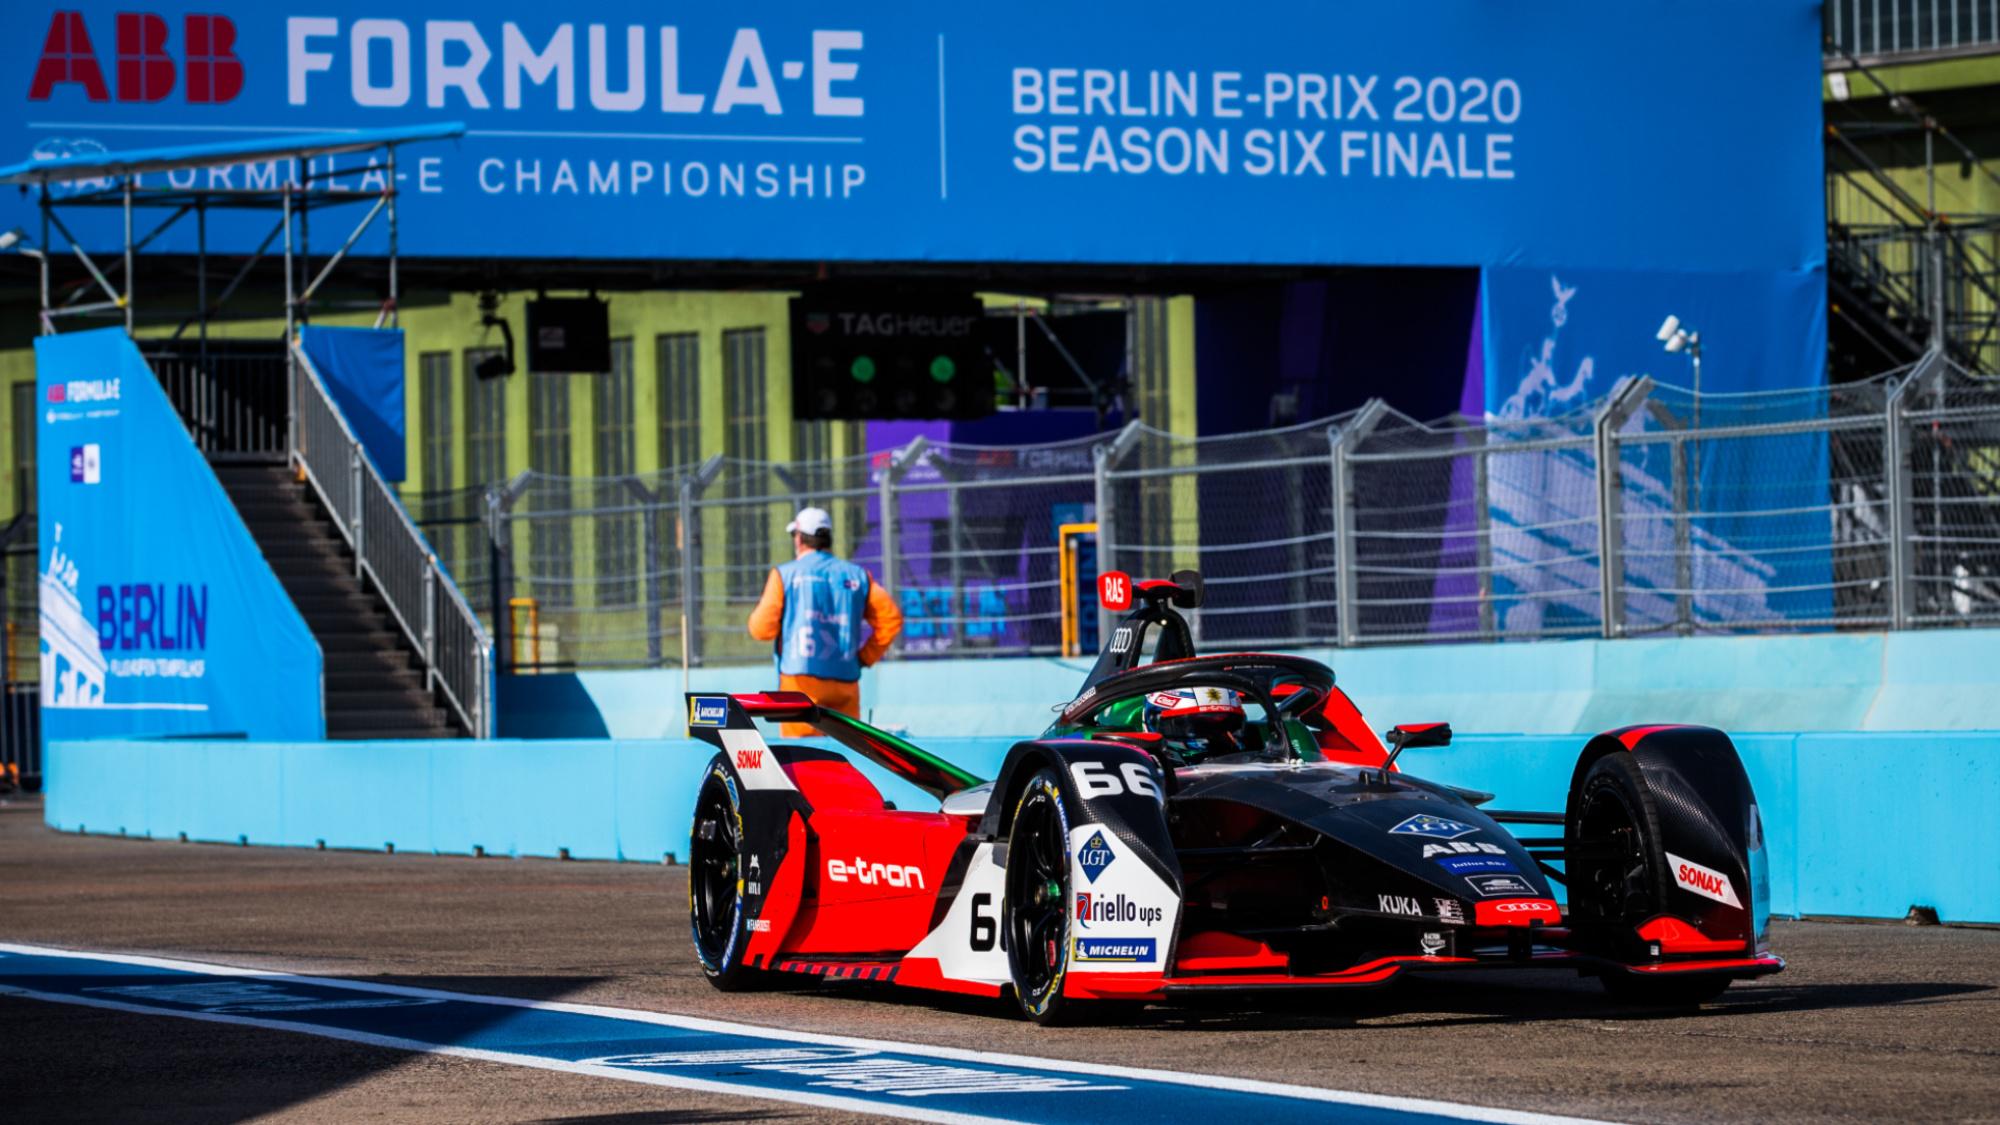 René Rast, Audi Formula E, 2020